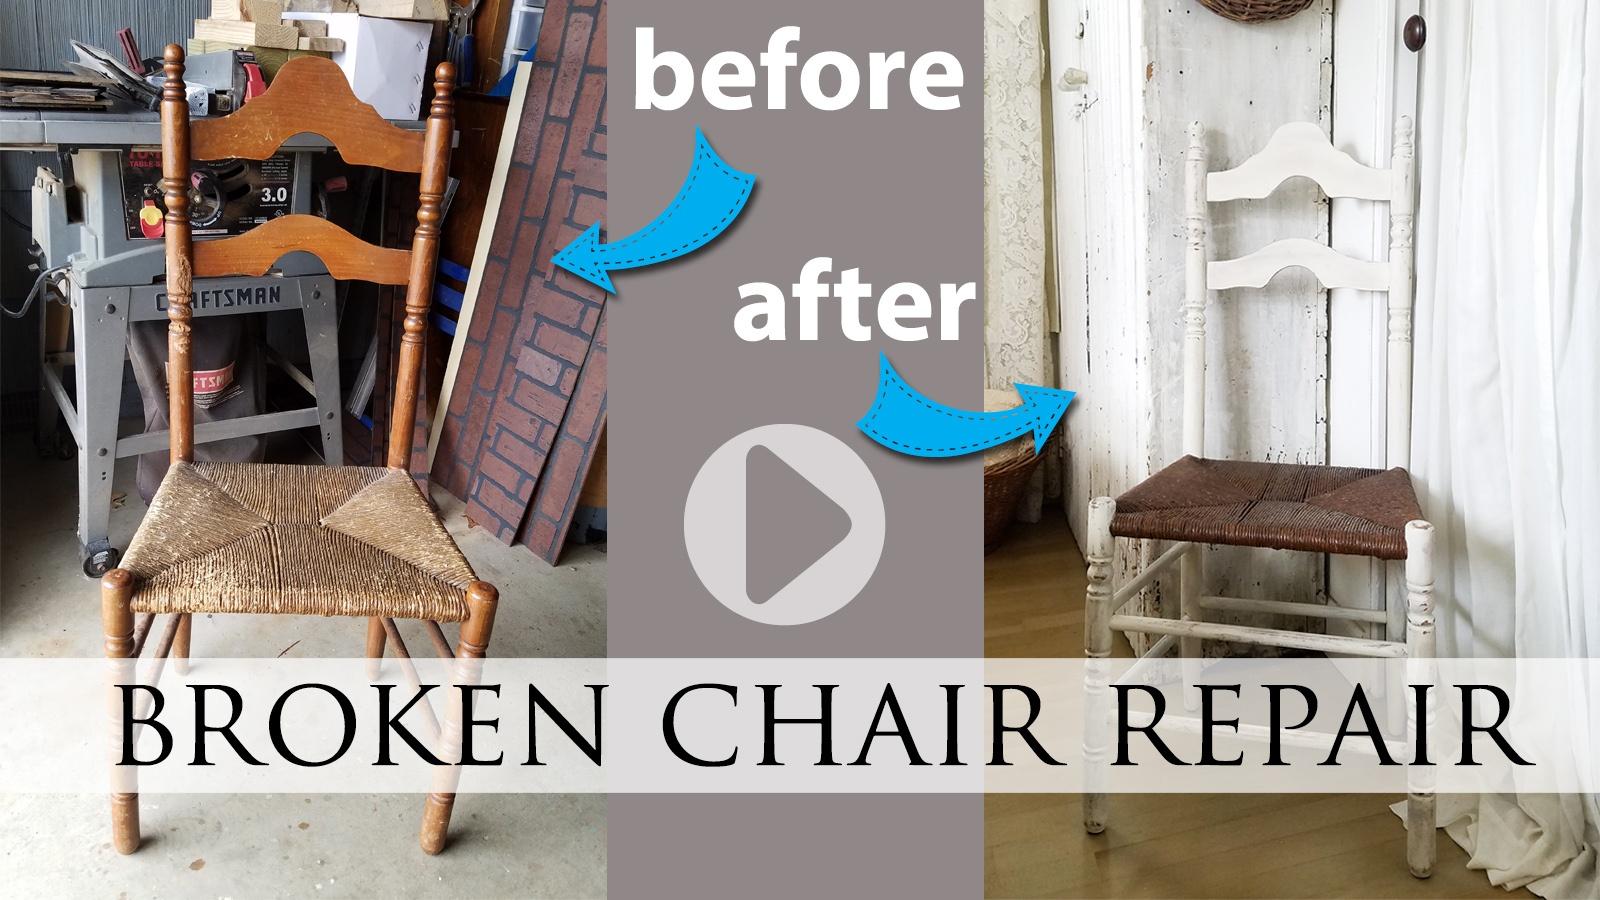 Broken Chair Repair Video Tutorial by Larissa of Prodigal Pieces | prodigalpieces.com #prodigalpieces